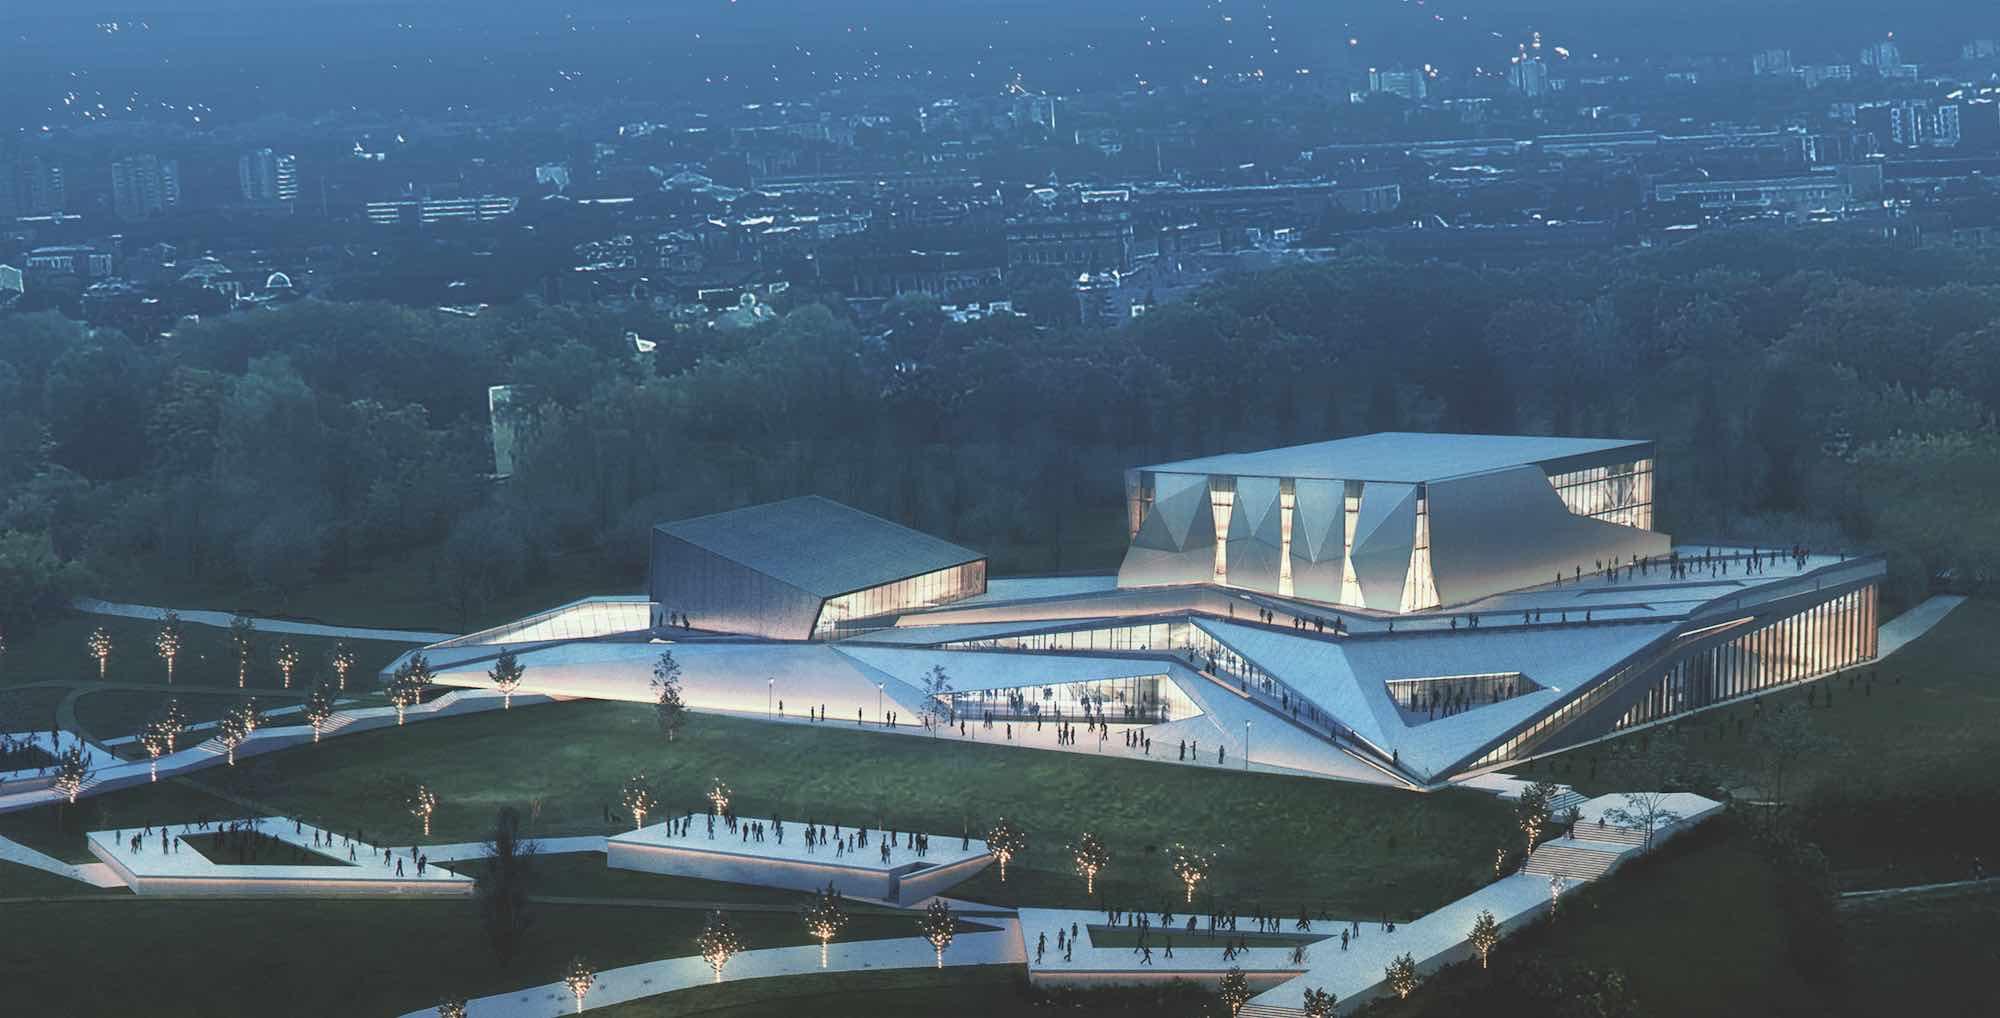 rendering image of concert hall